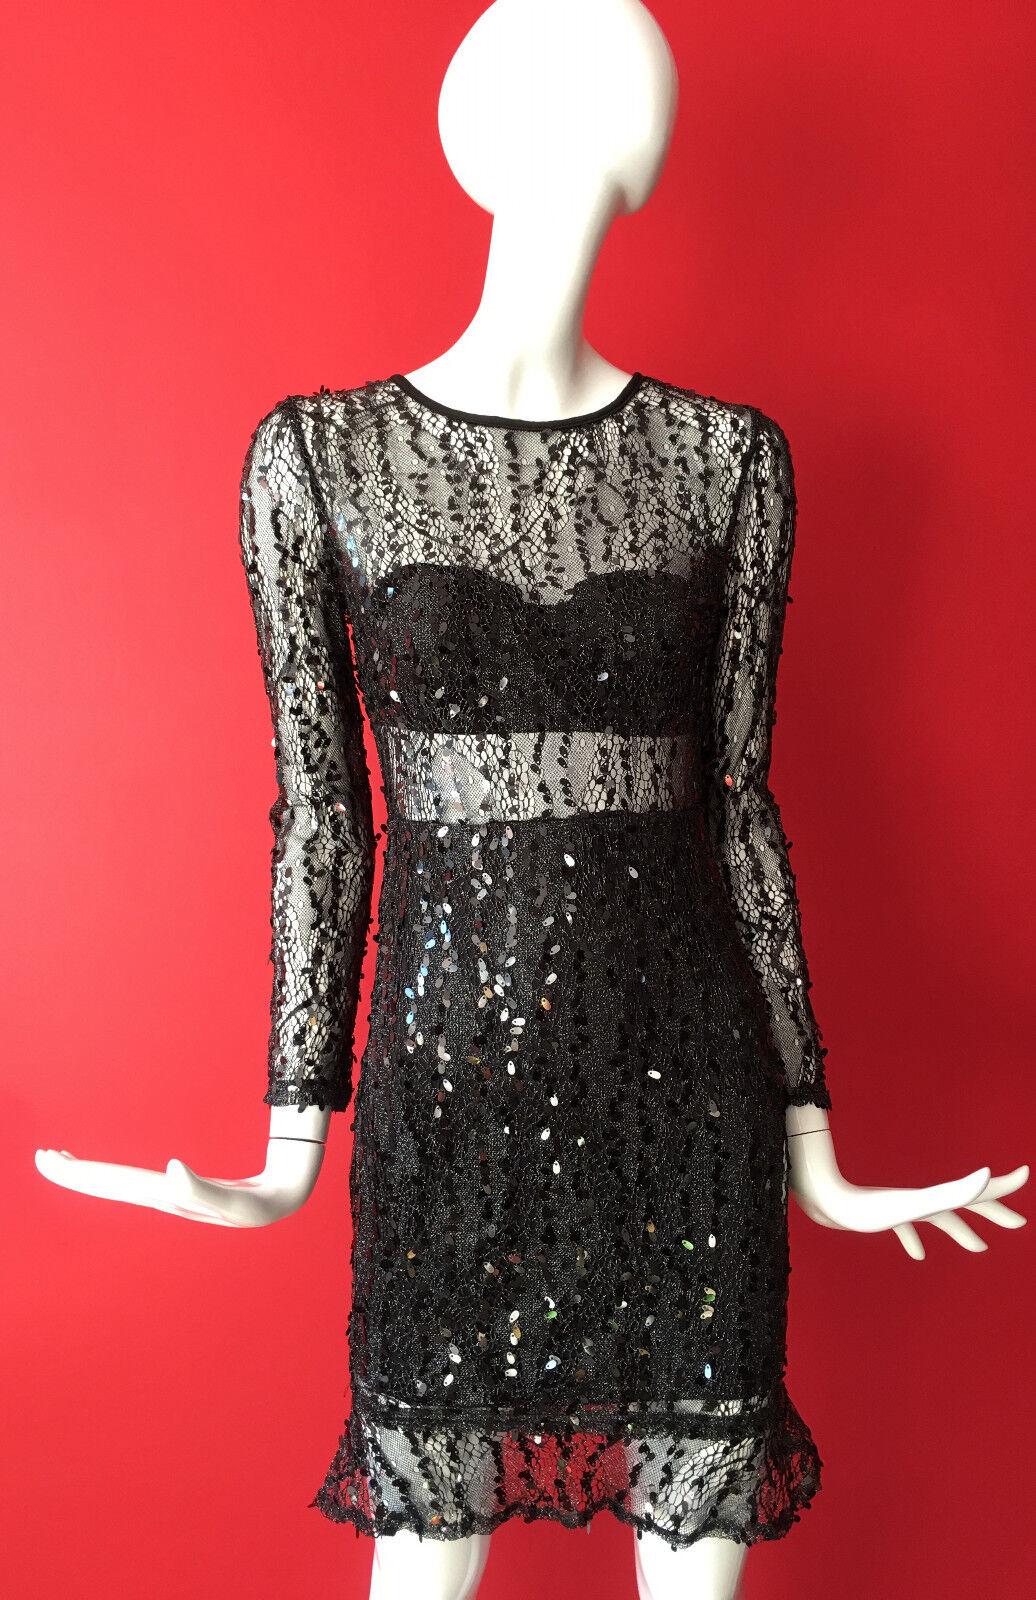 NaaNaa Long Sleeve Party Mesh Sequin Dress Size 8 BNWT